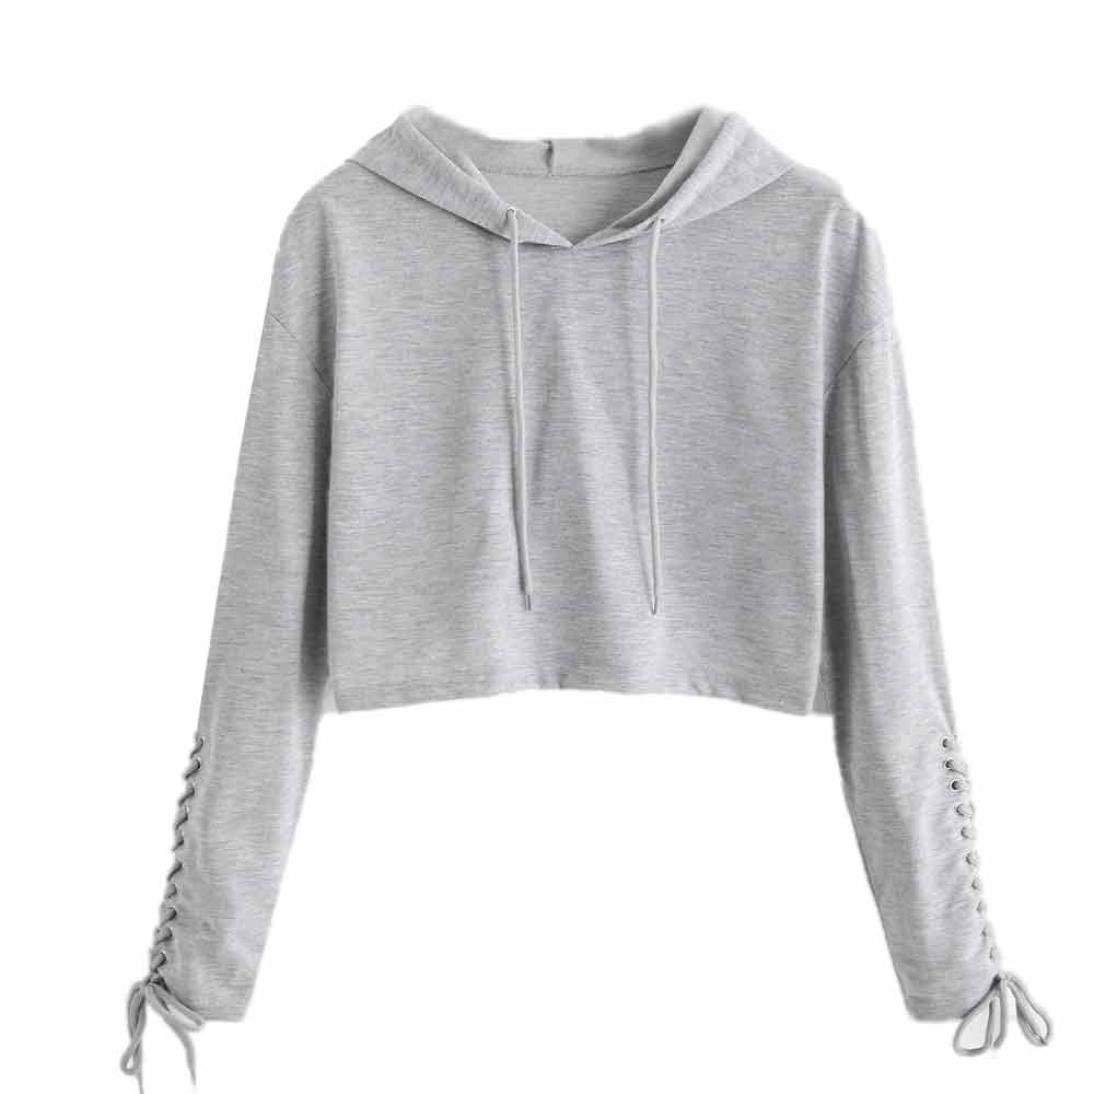 44ea7d23350 Get Quotations · Women Hoodie Sweatshirt Crop Top Sports Pullover Shirt  Casual Long Sleeve Blouse